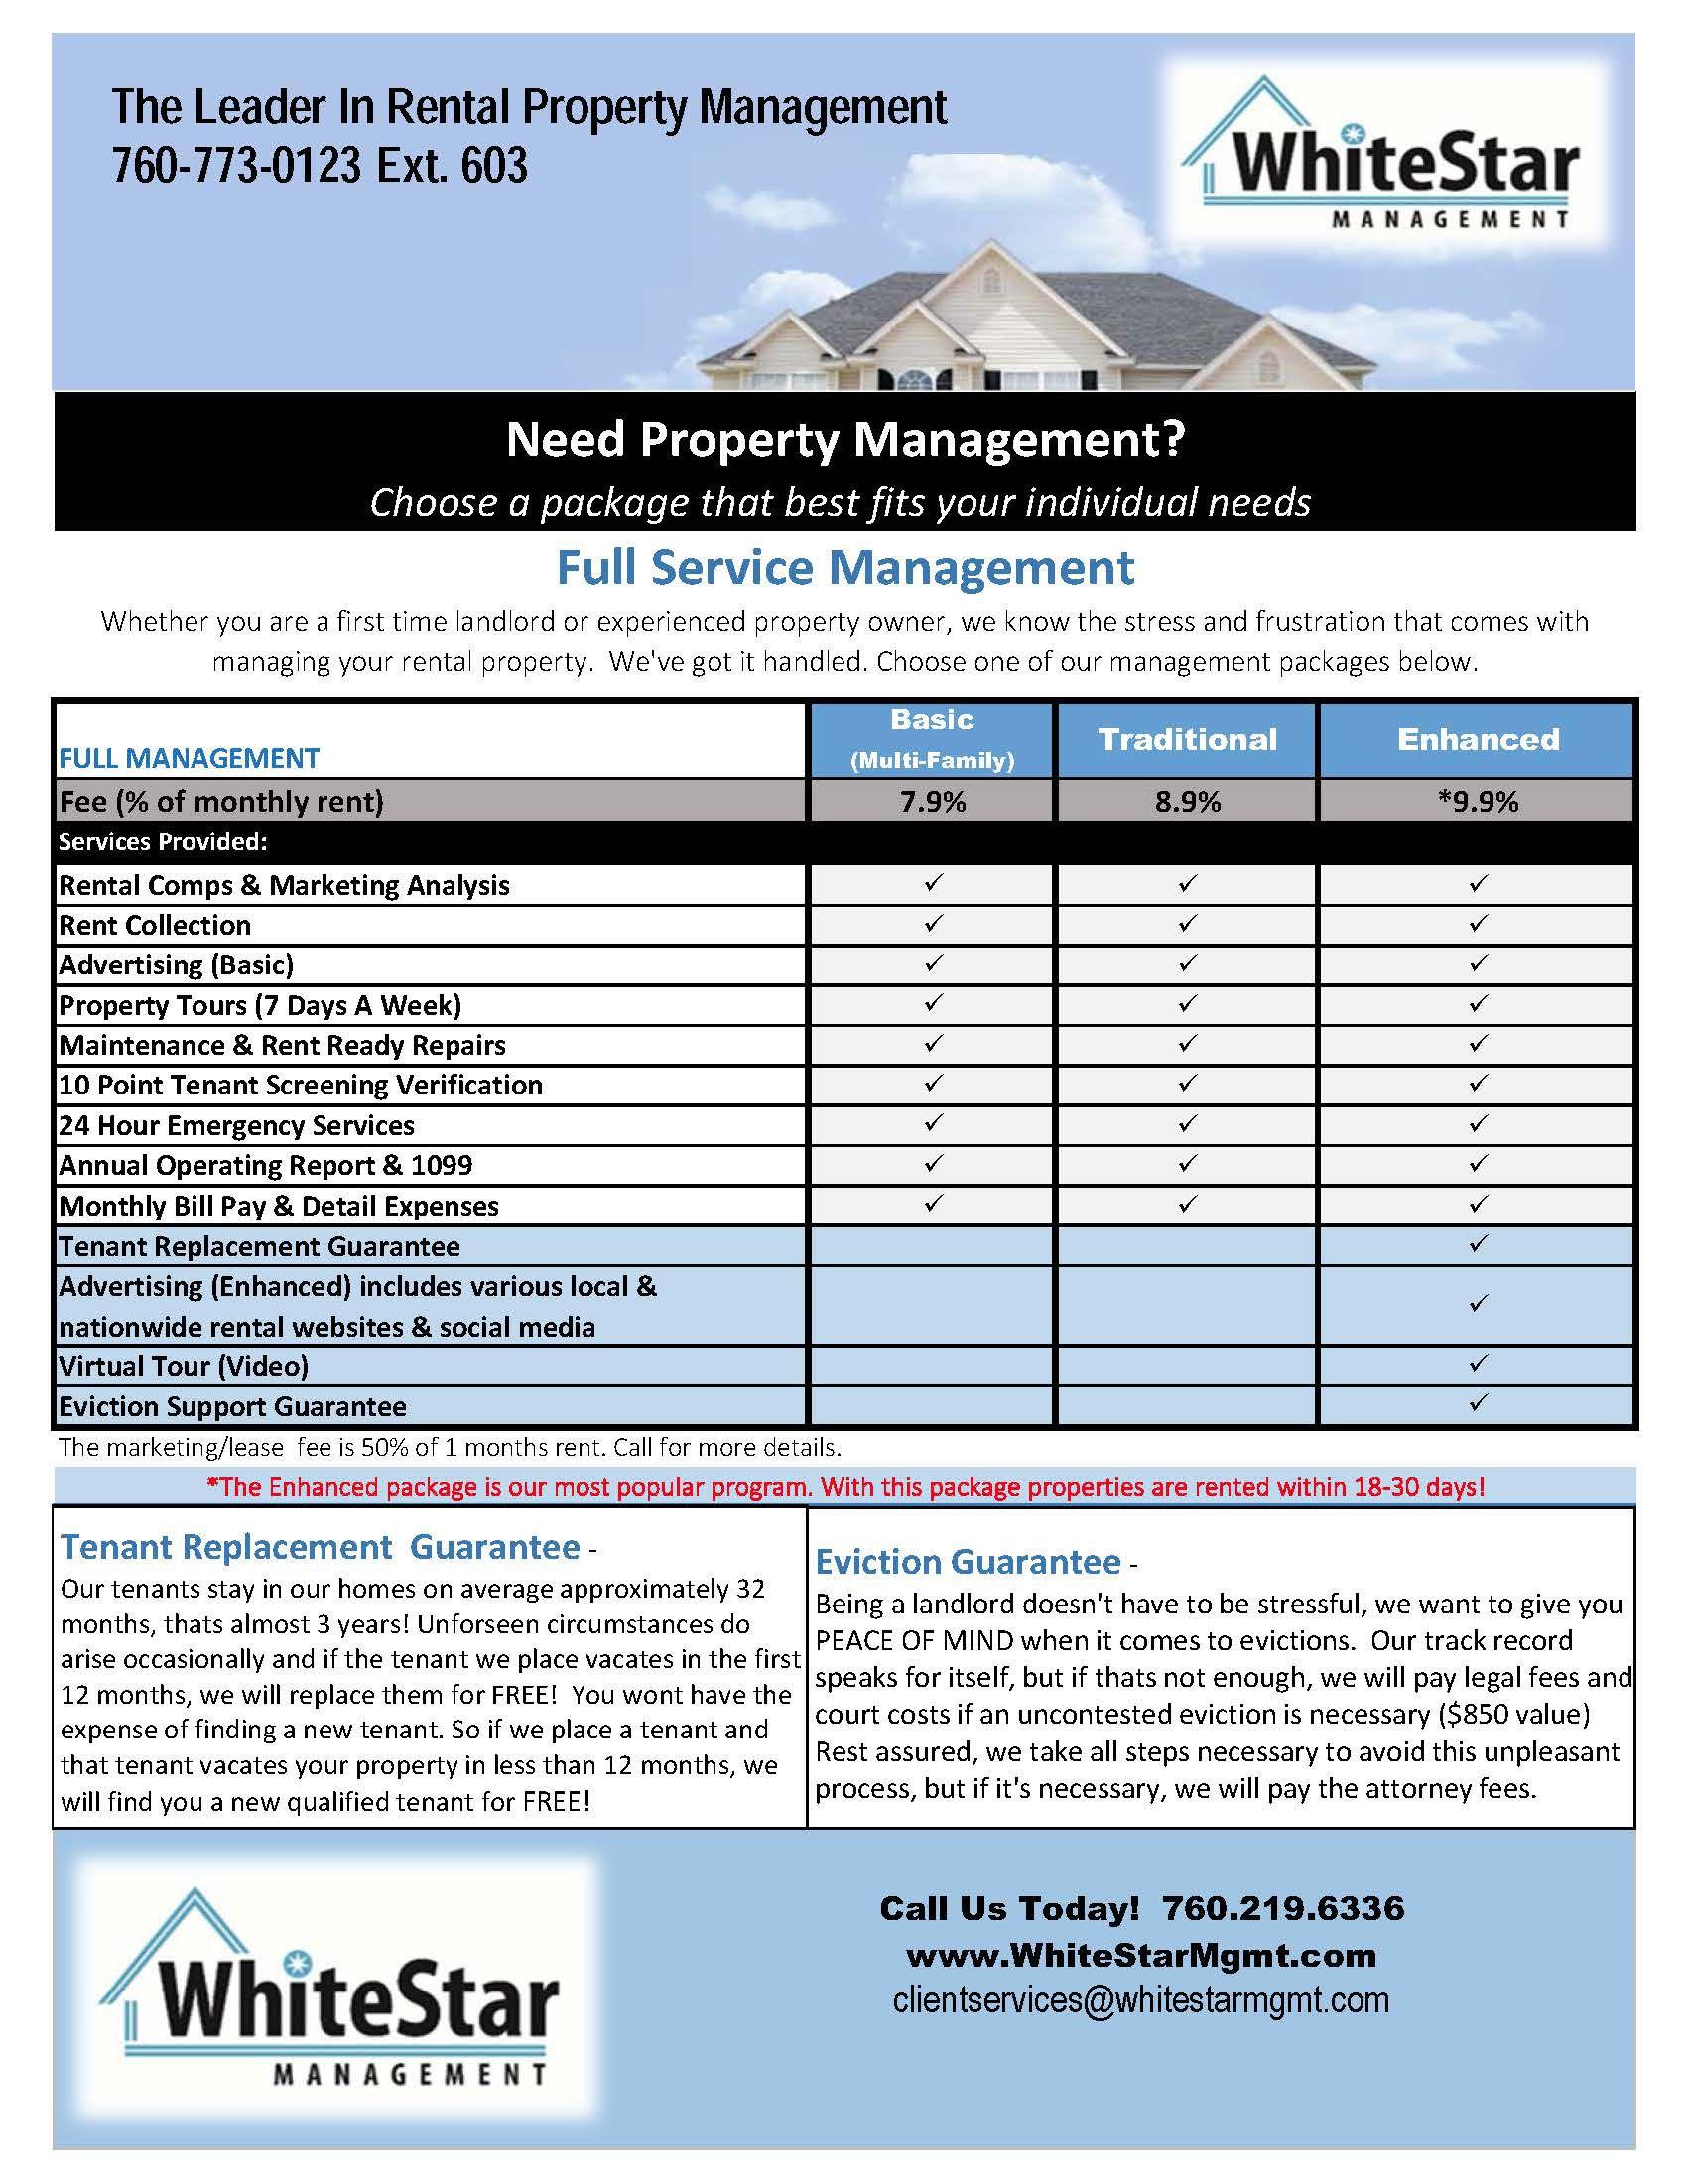 1 Whitestar Management Services